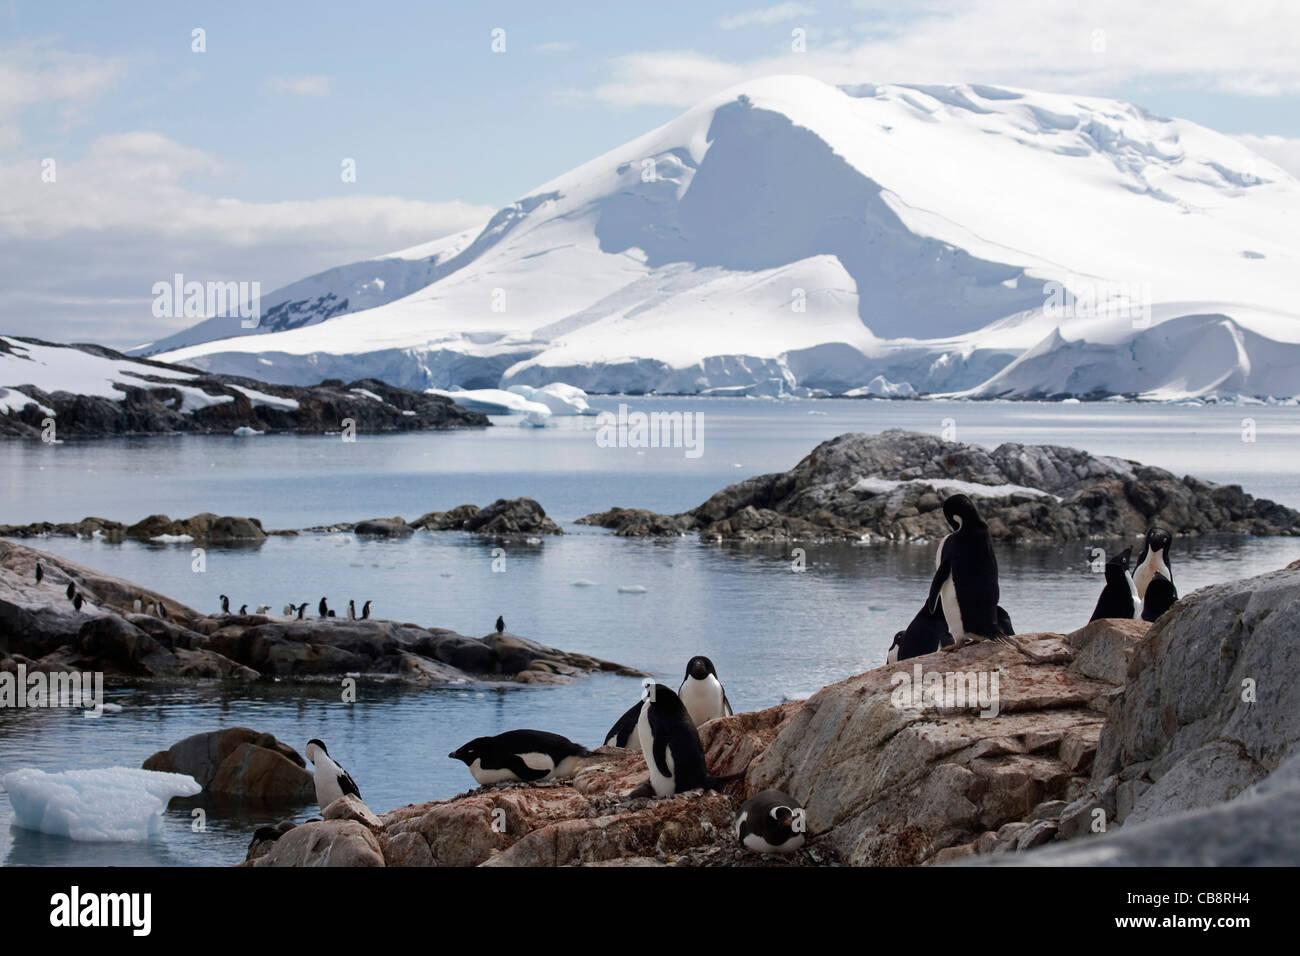 Adélie Penguin (Pygoscelis adeliae) colony on Petermann Island, Antarctica - Stock Image